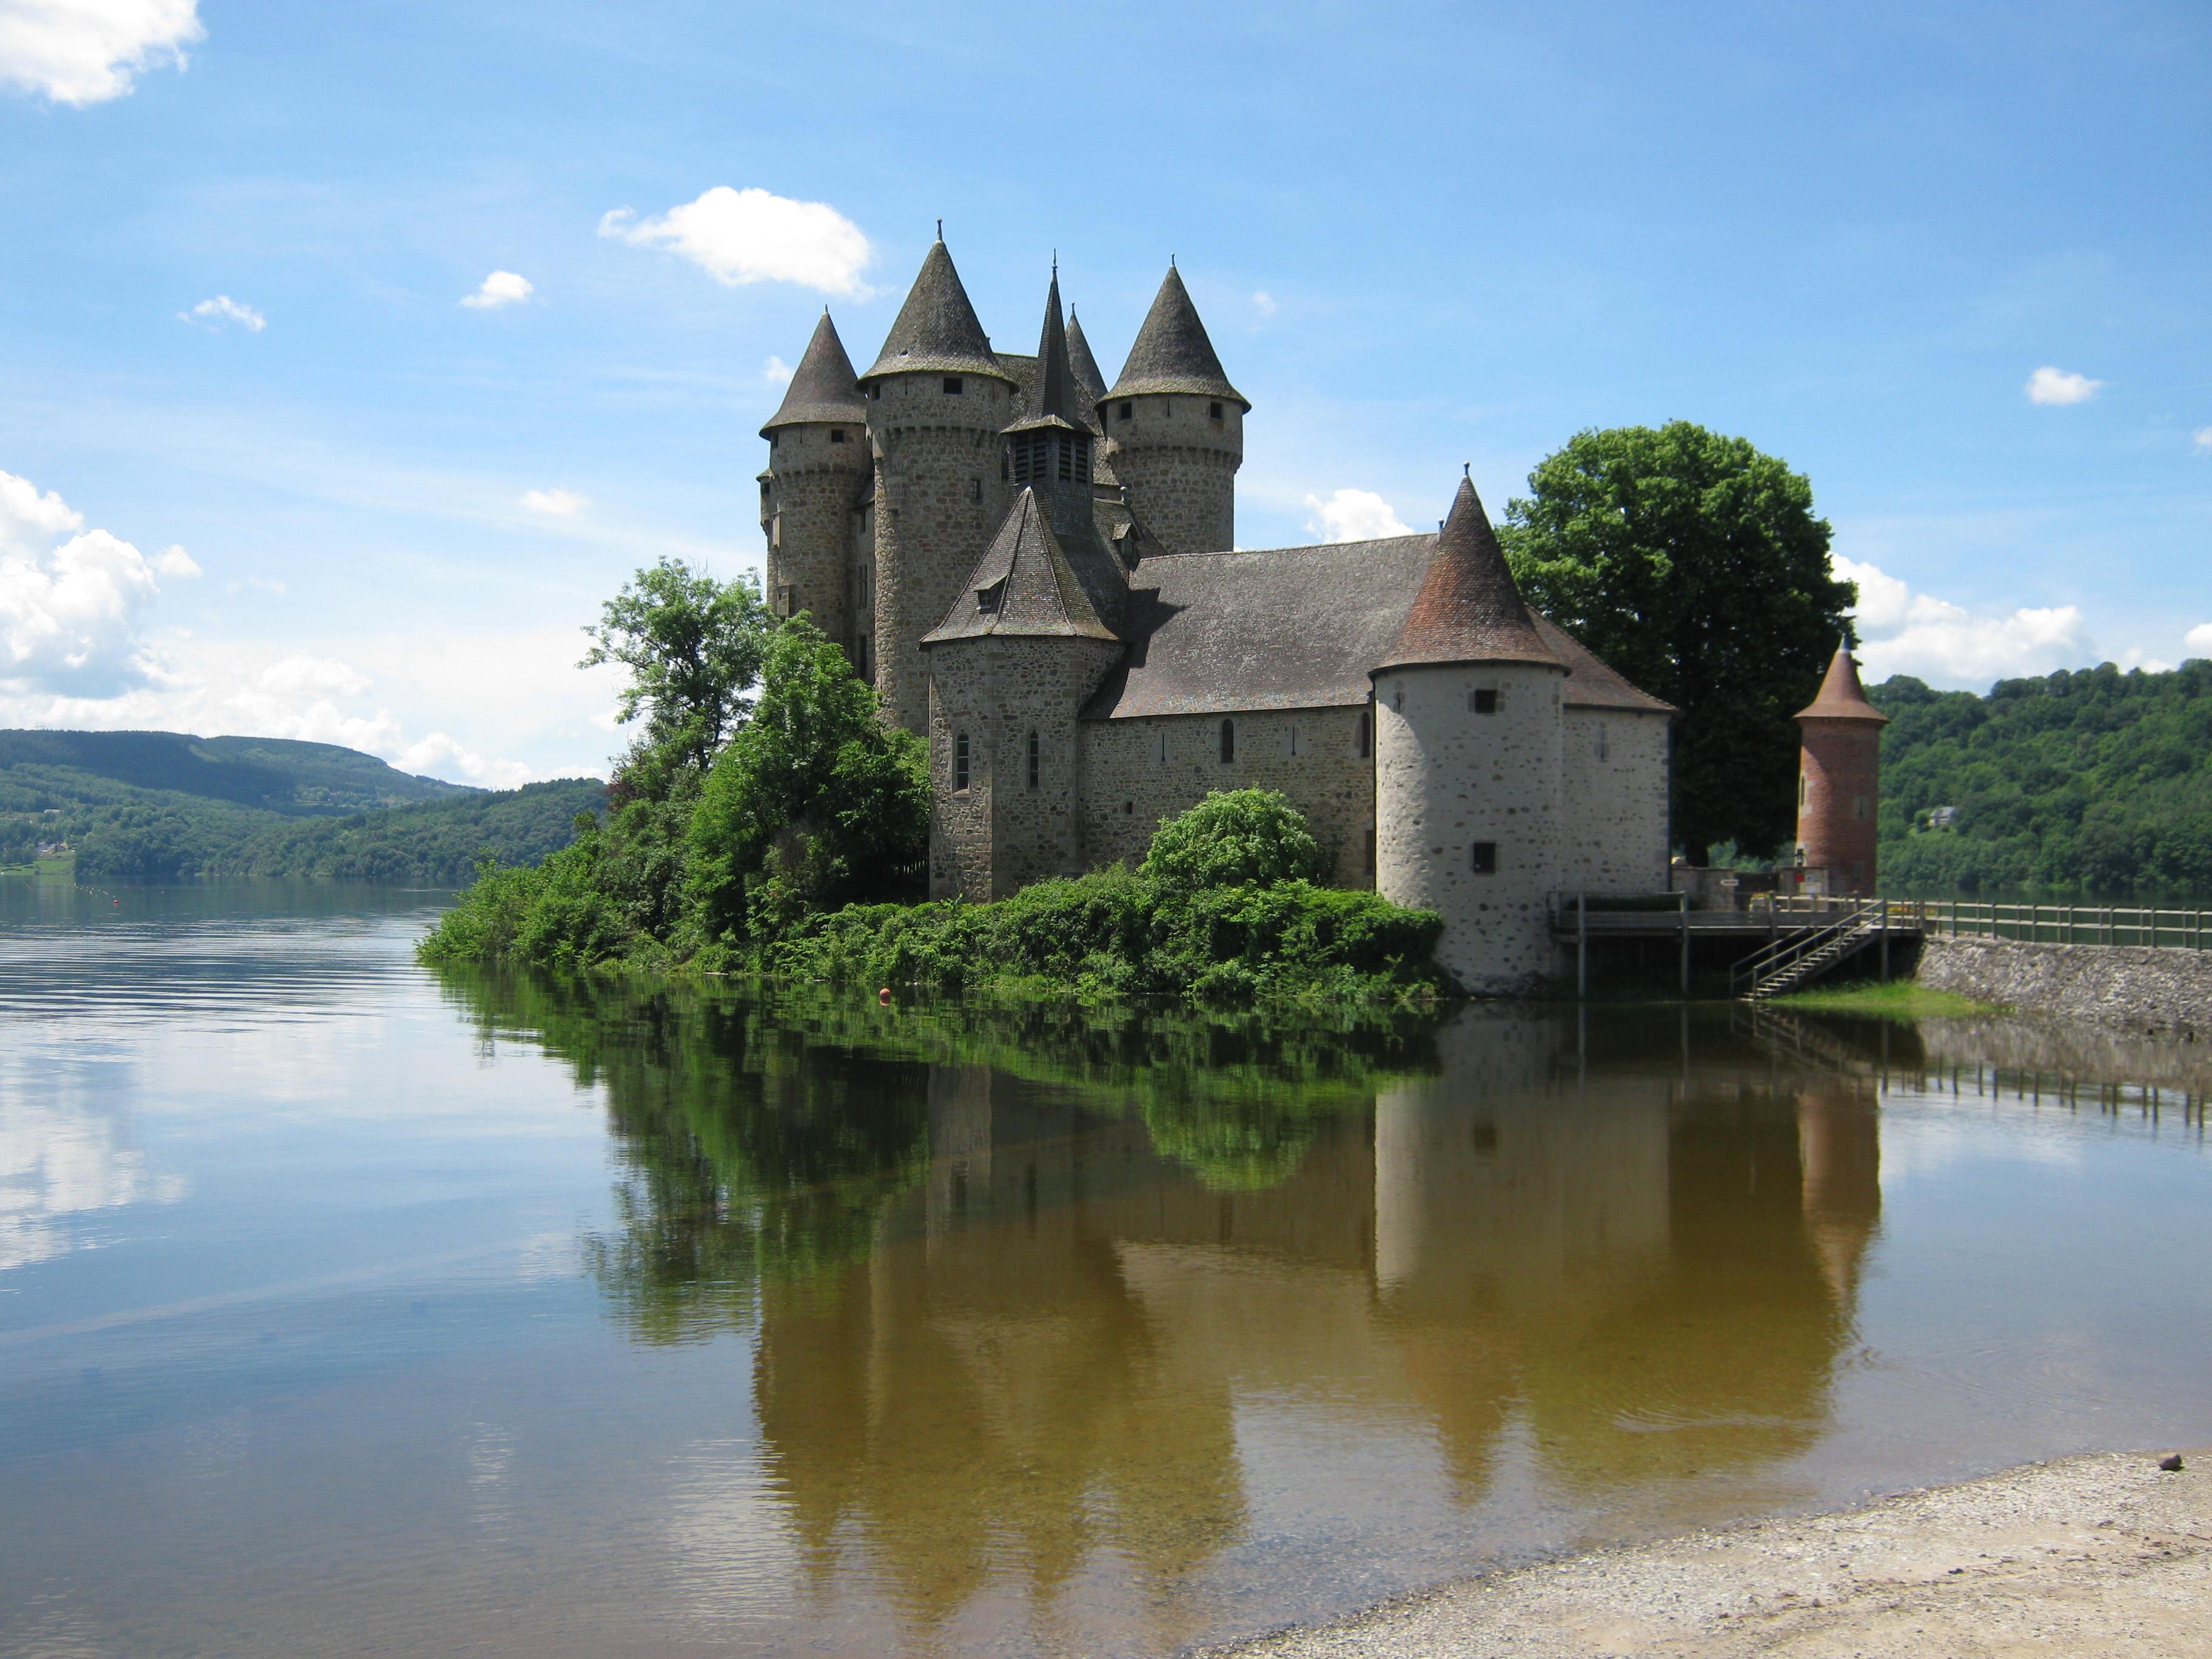 1736-chateau-de-val-lanobre-cantal.jpg